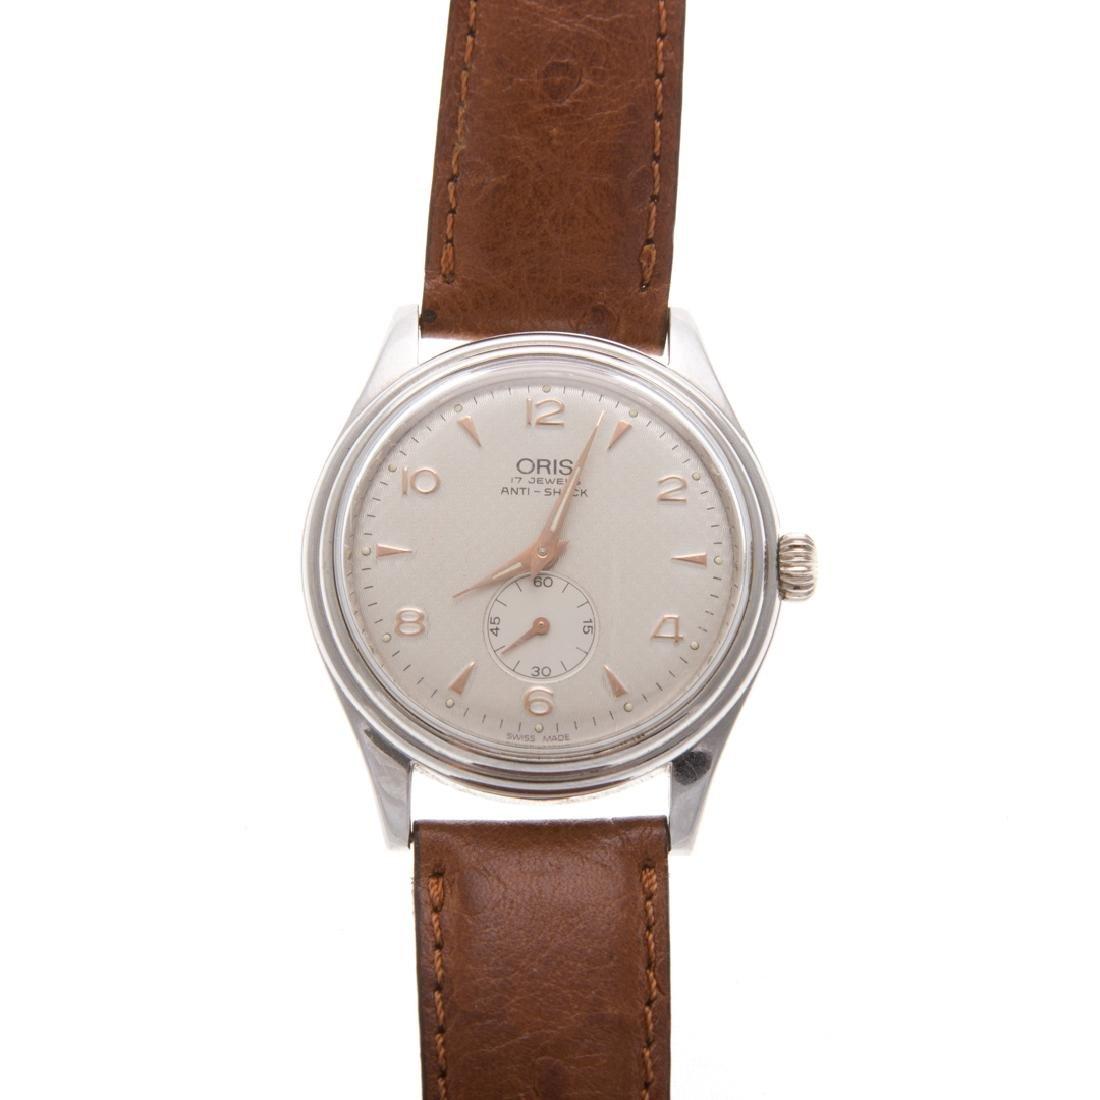 A Gent's Stainless Oris Wrist Watch